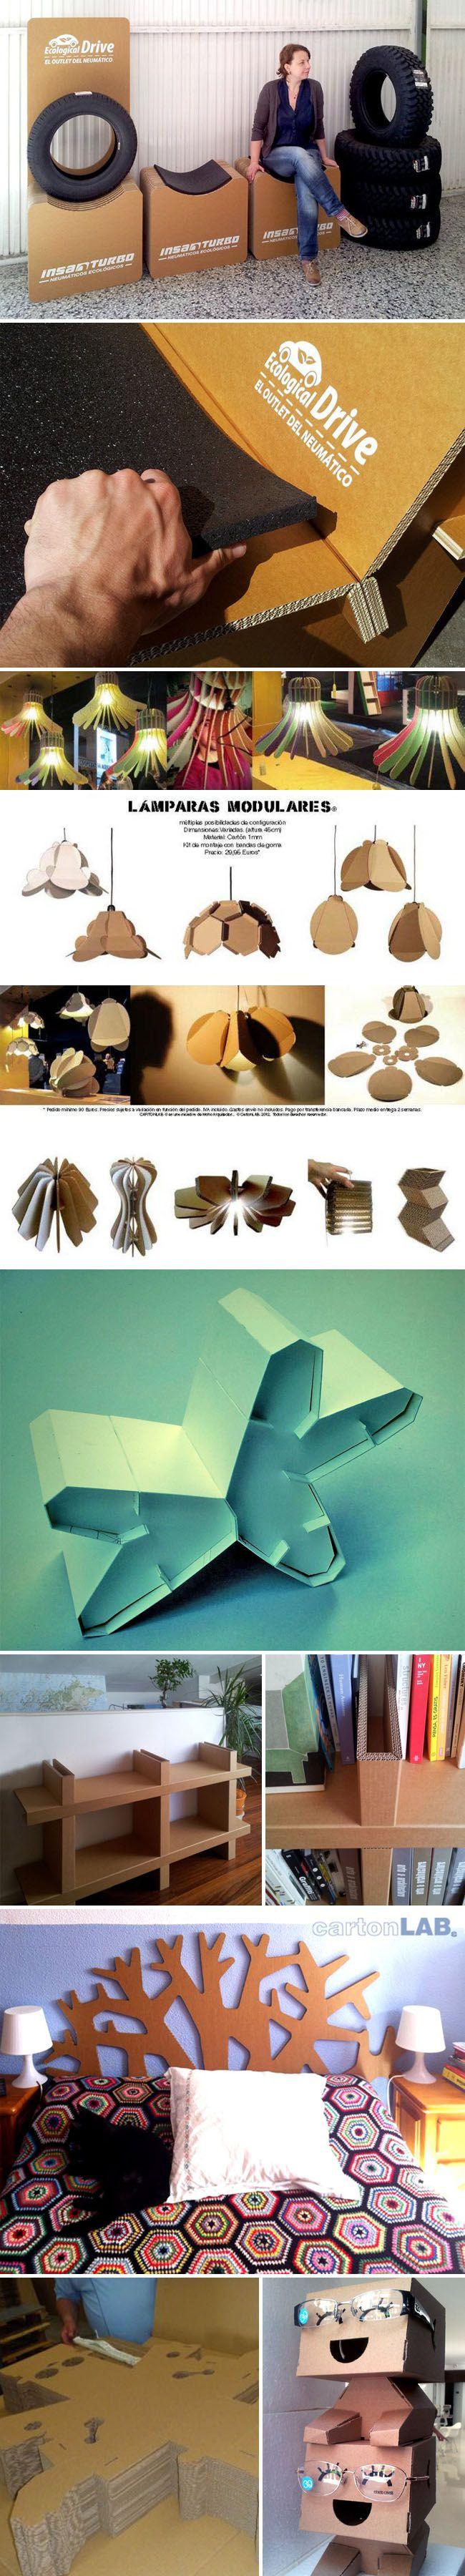 CartonLAB_cardboard-furniture_retail-displays_tradeshow_booths_collabcubed